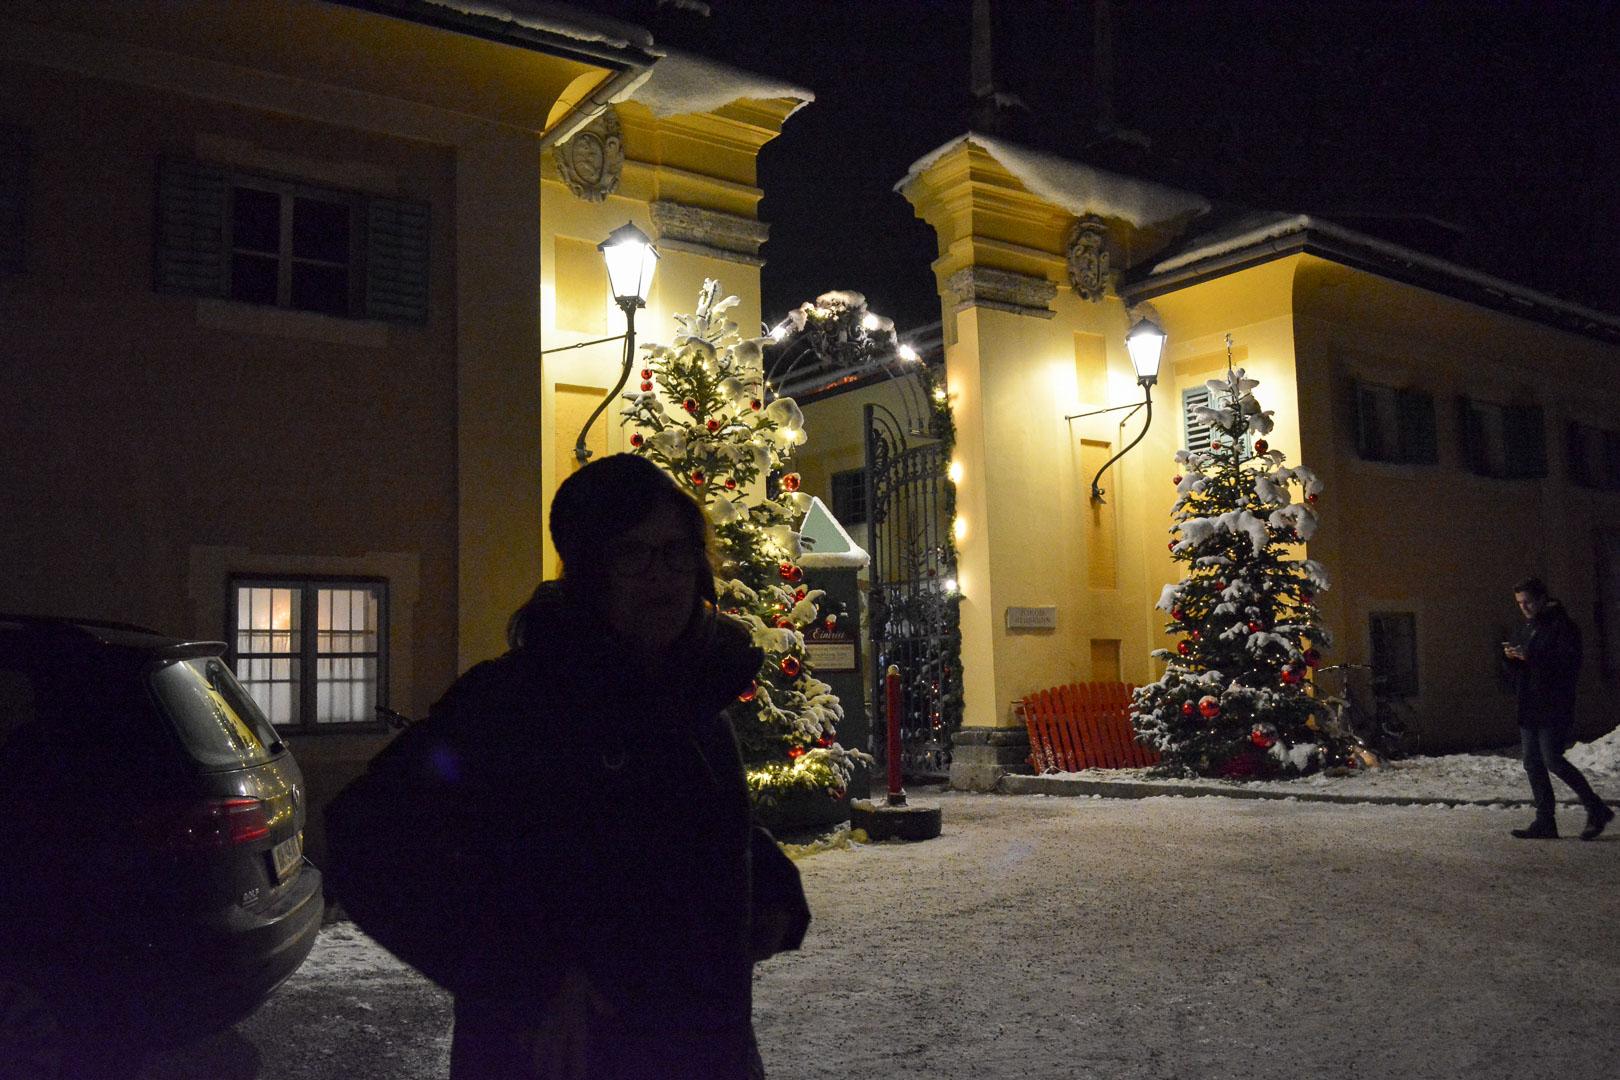 Back to Hellbrunn for their Christmas Market